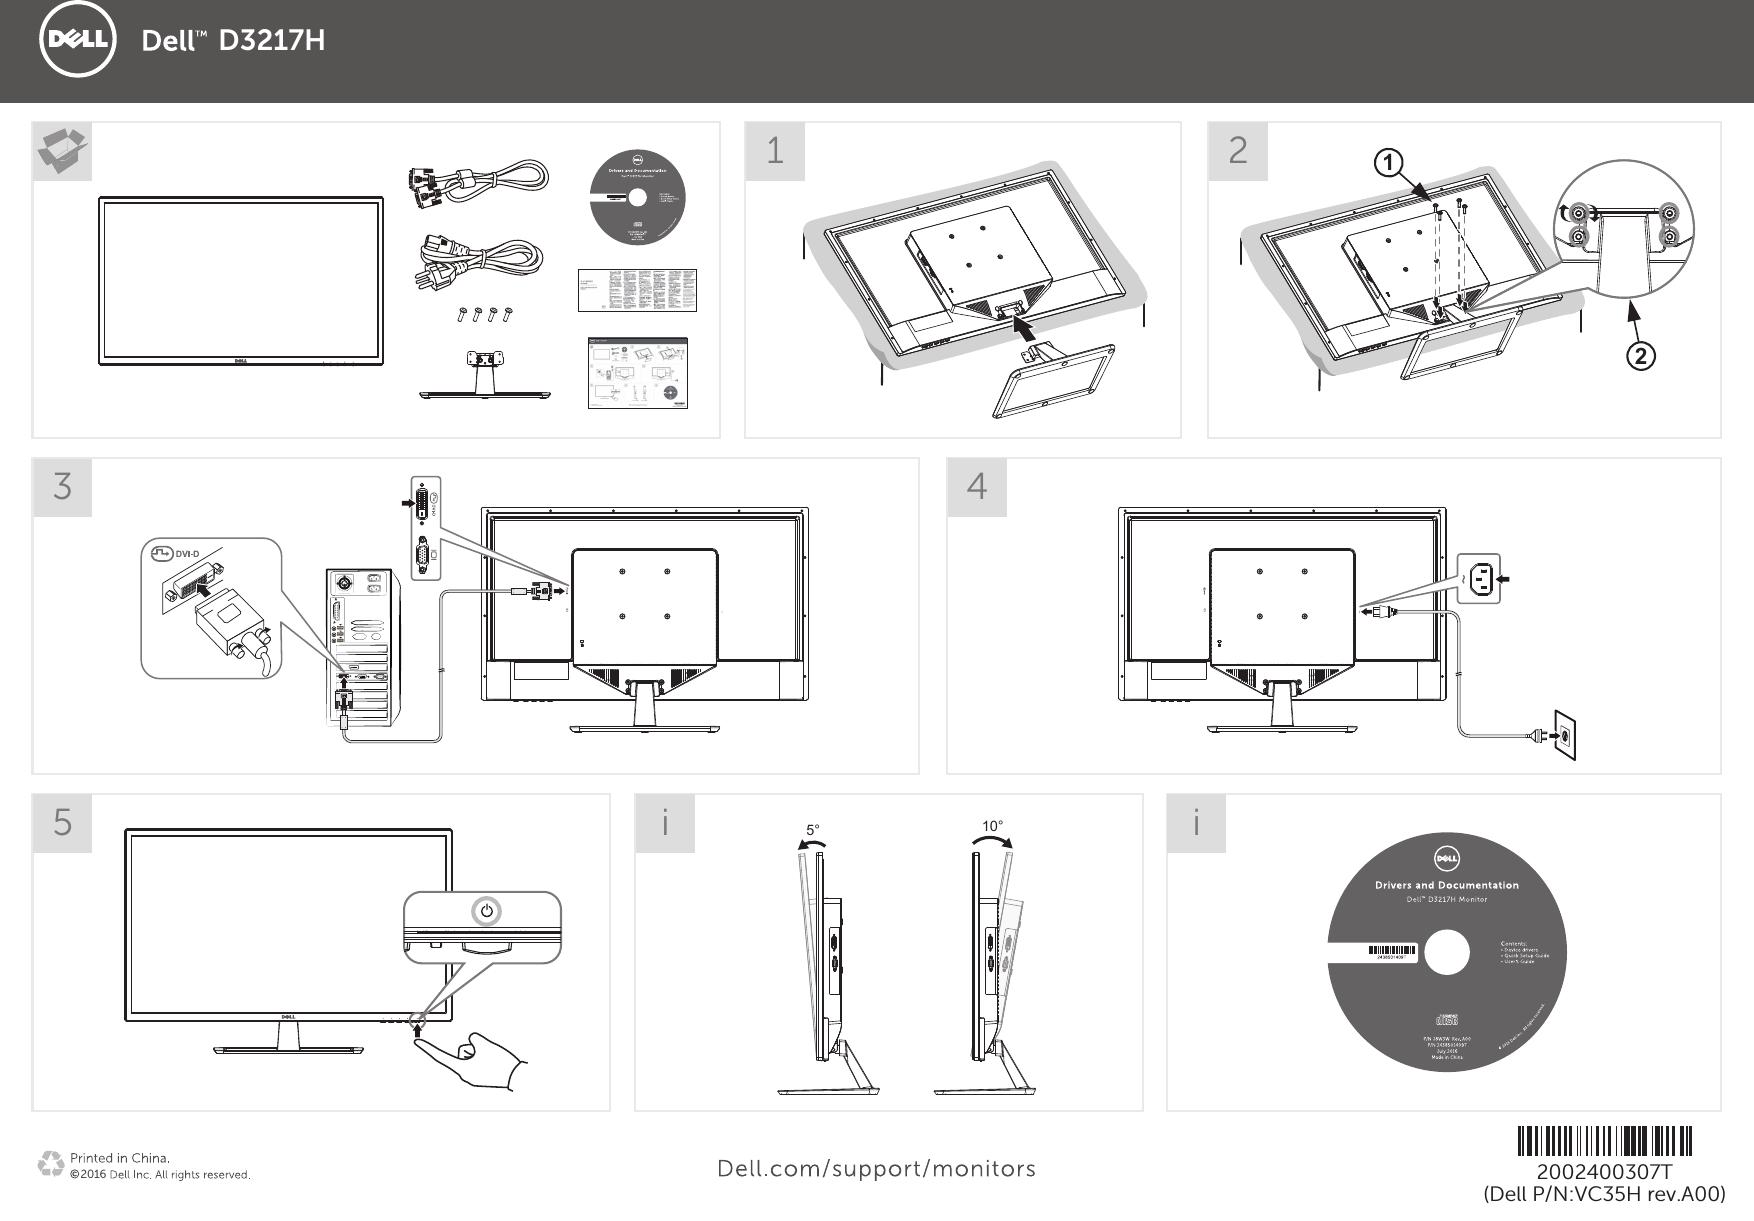 Dell d3217h monitor 快速入门指南 使用手册 其他文档 Setup Guide Zh cn